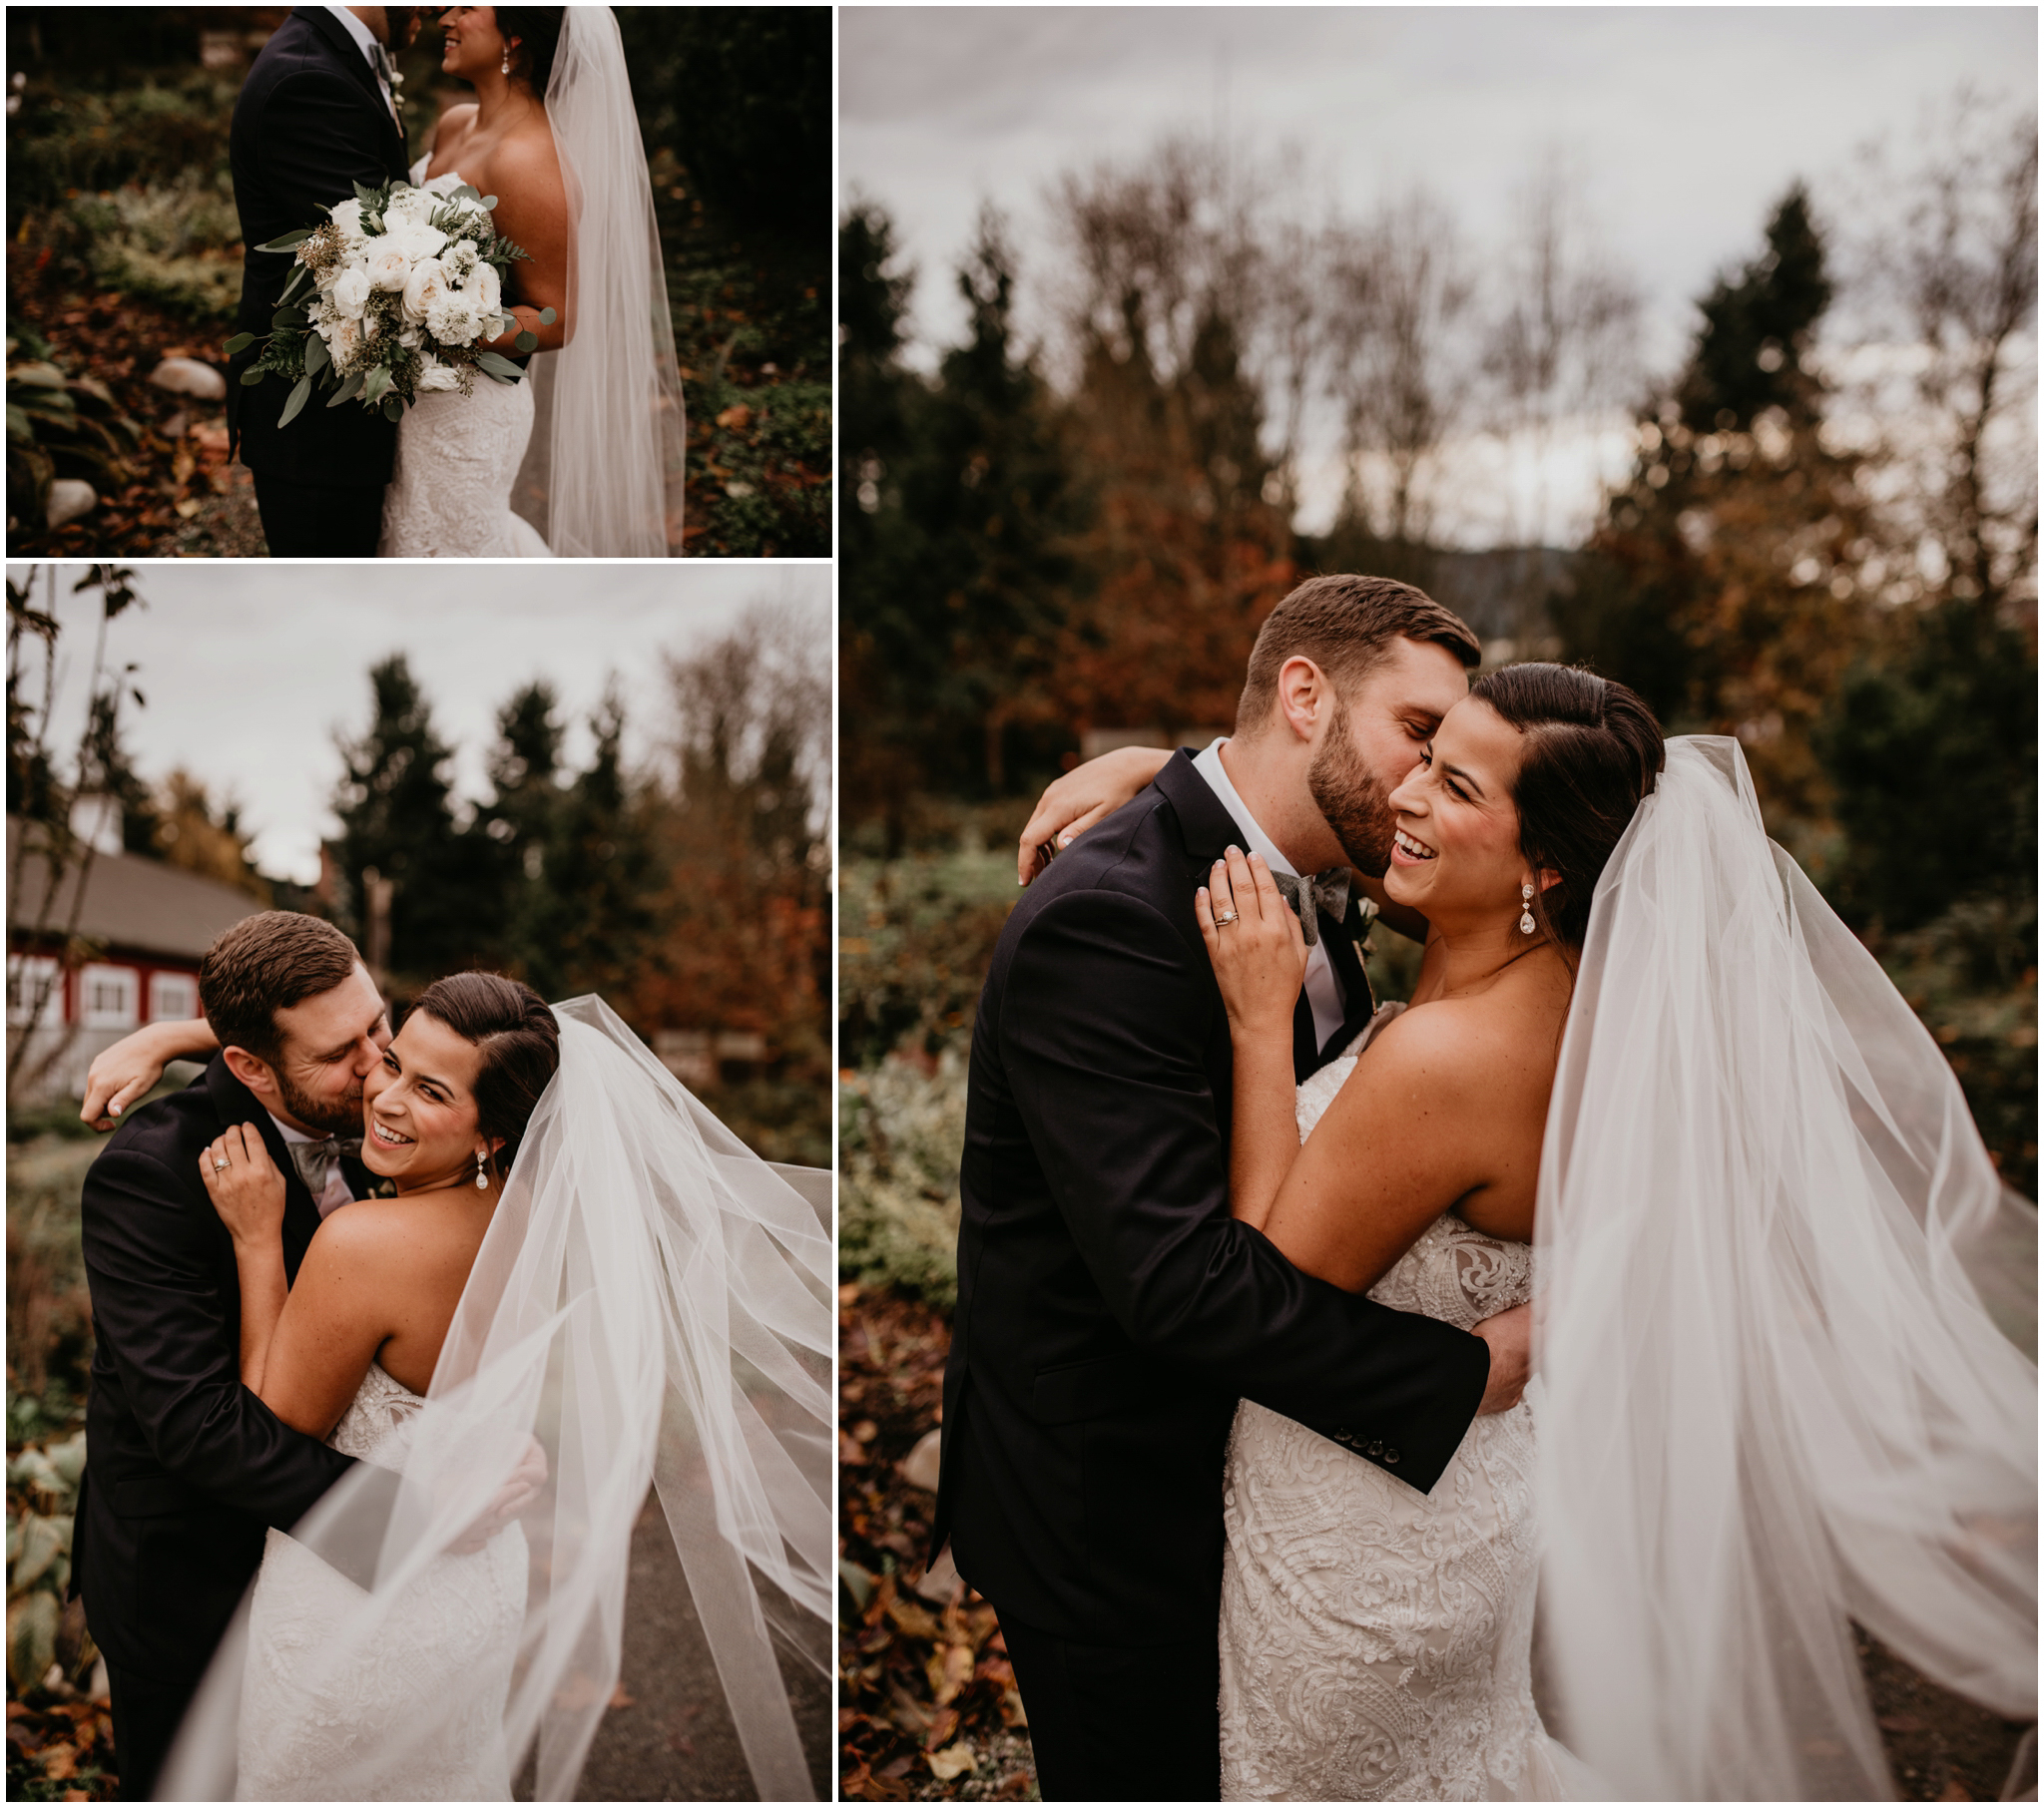 ashley-tj-the-pickering-barn-winter-wedding-seattle-photographer-046.jpg